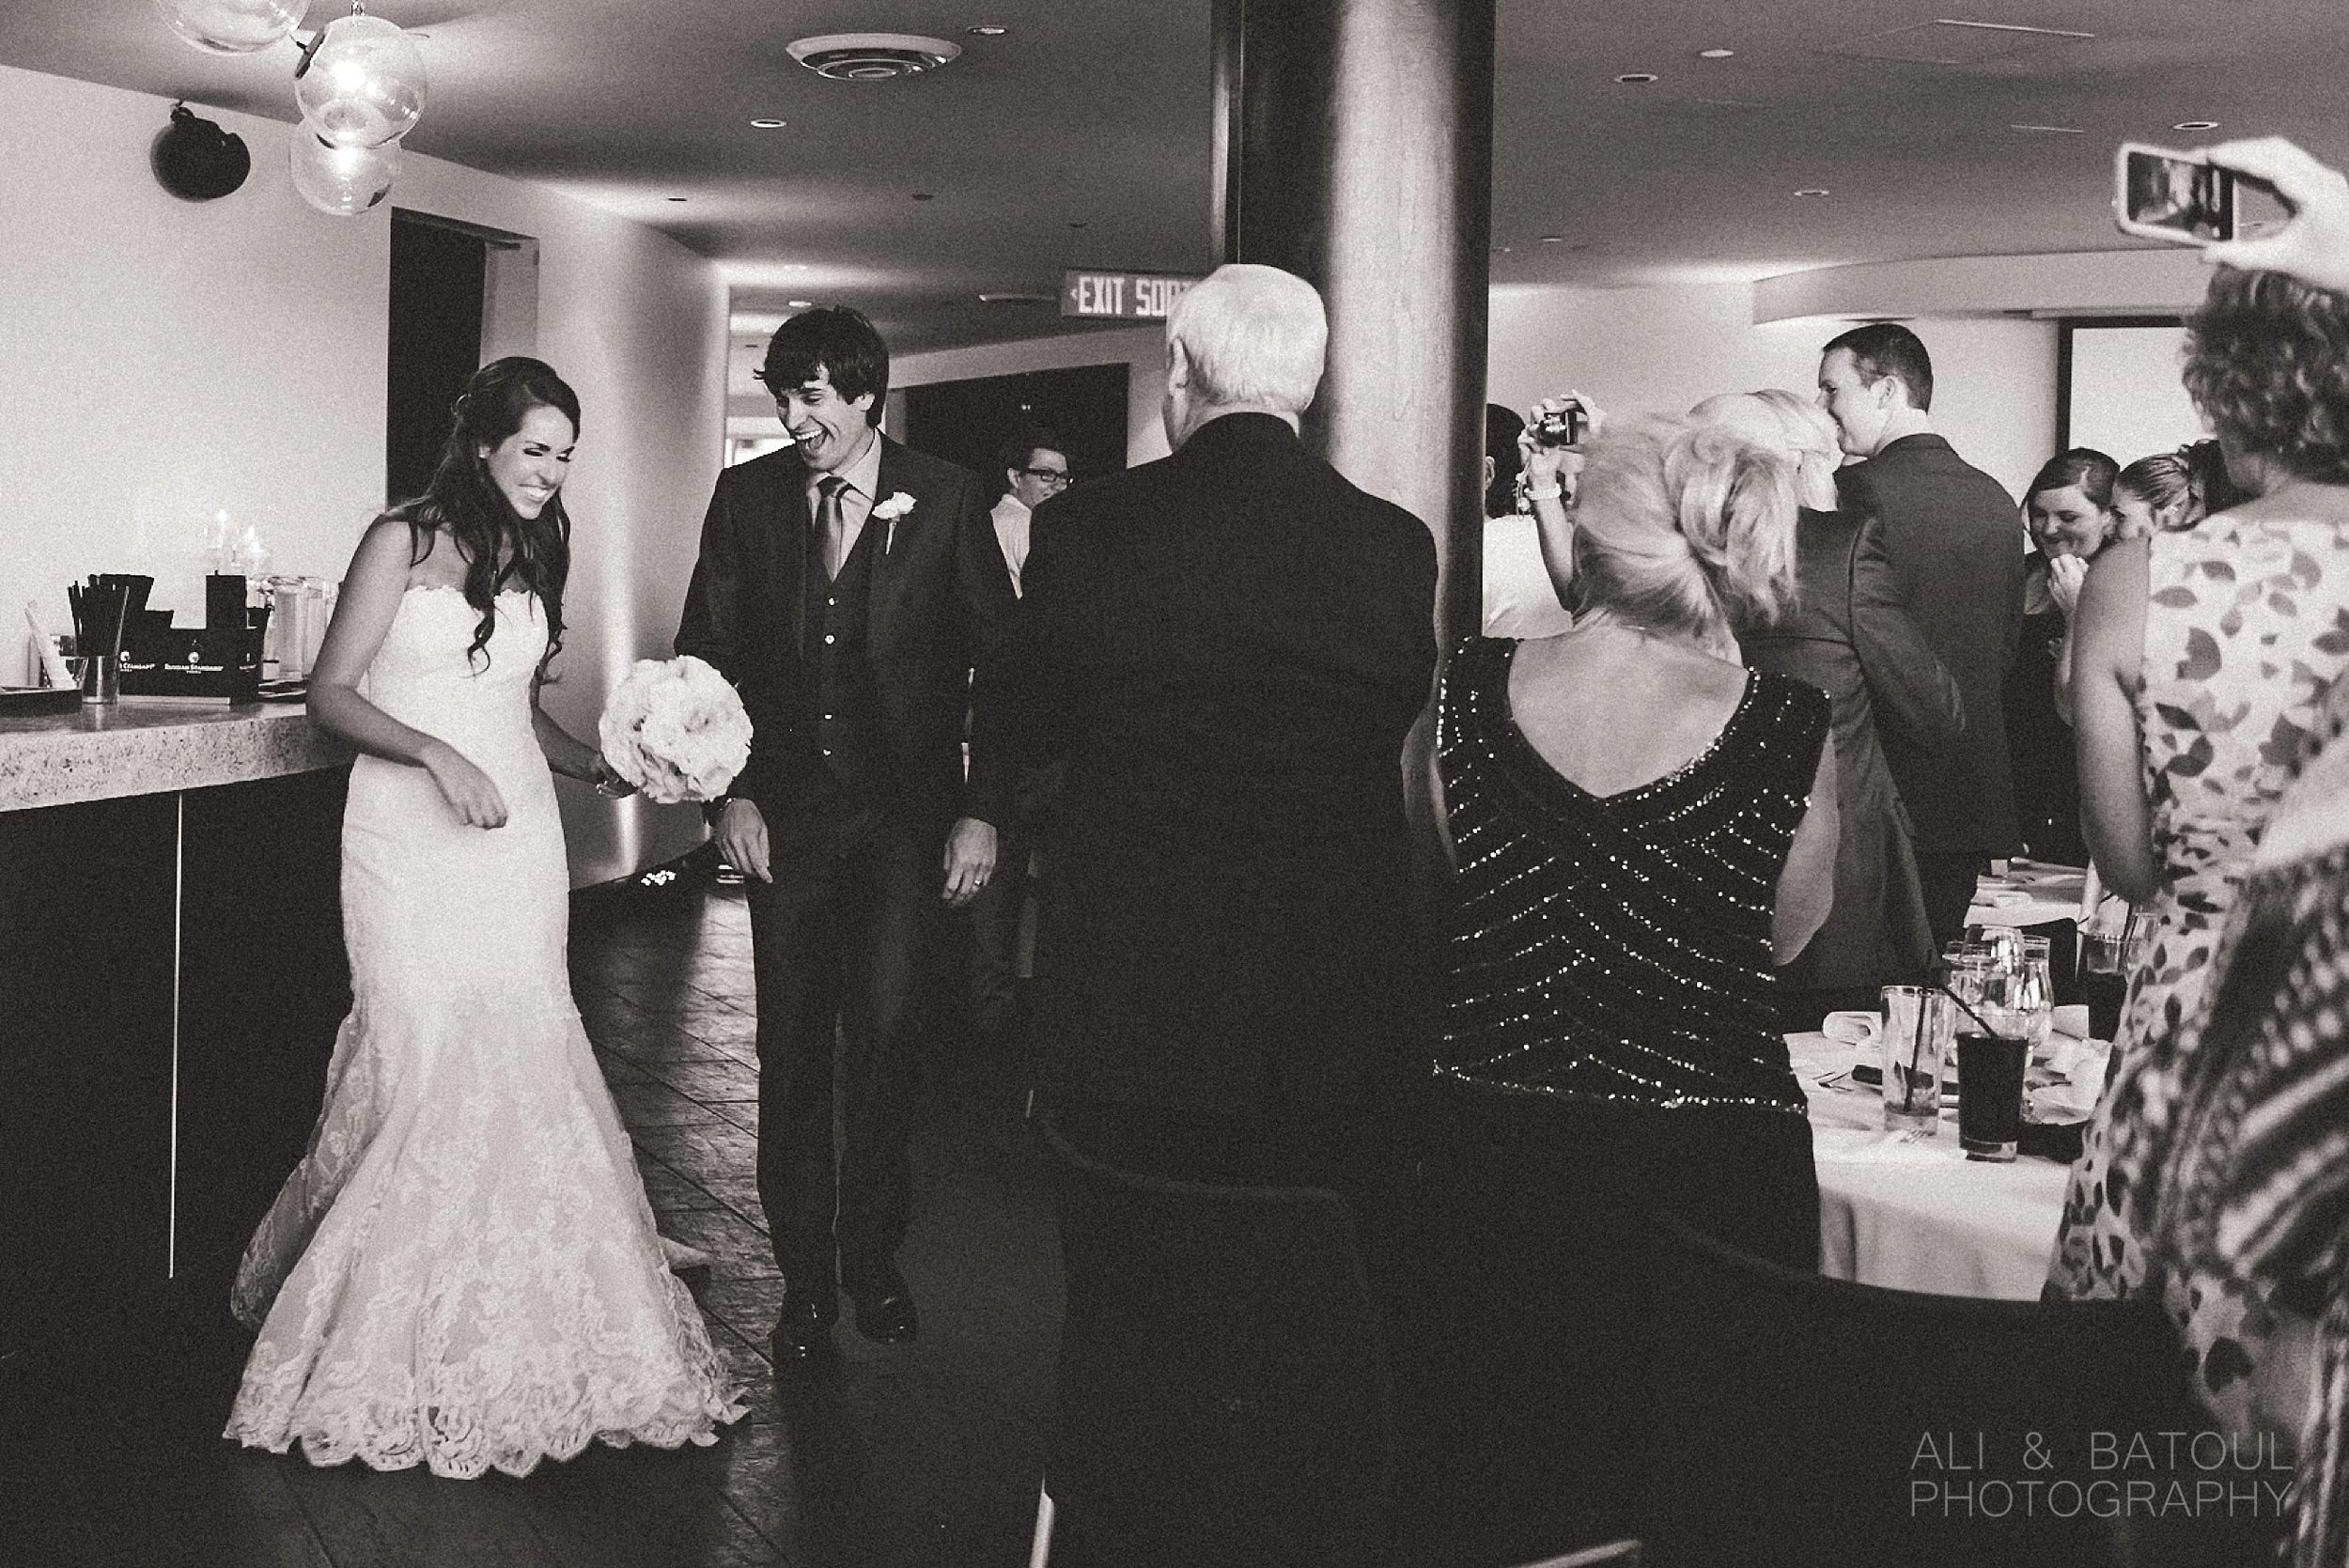 Ali & Batoul Photography - Documentary Fine Art Ottawa Wedding Photography_0077.jpg